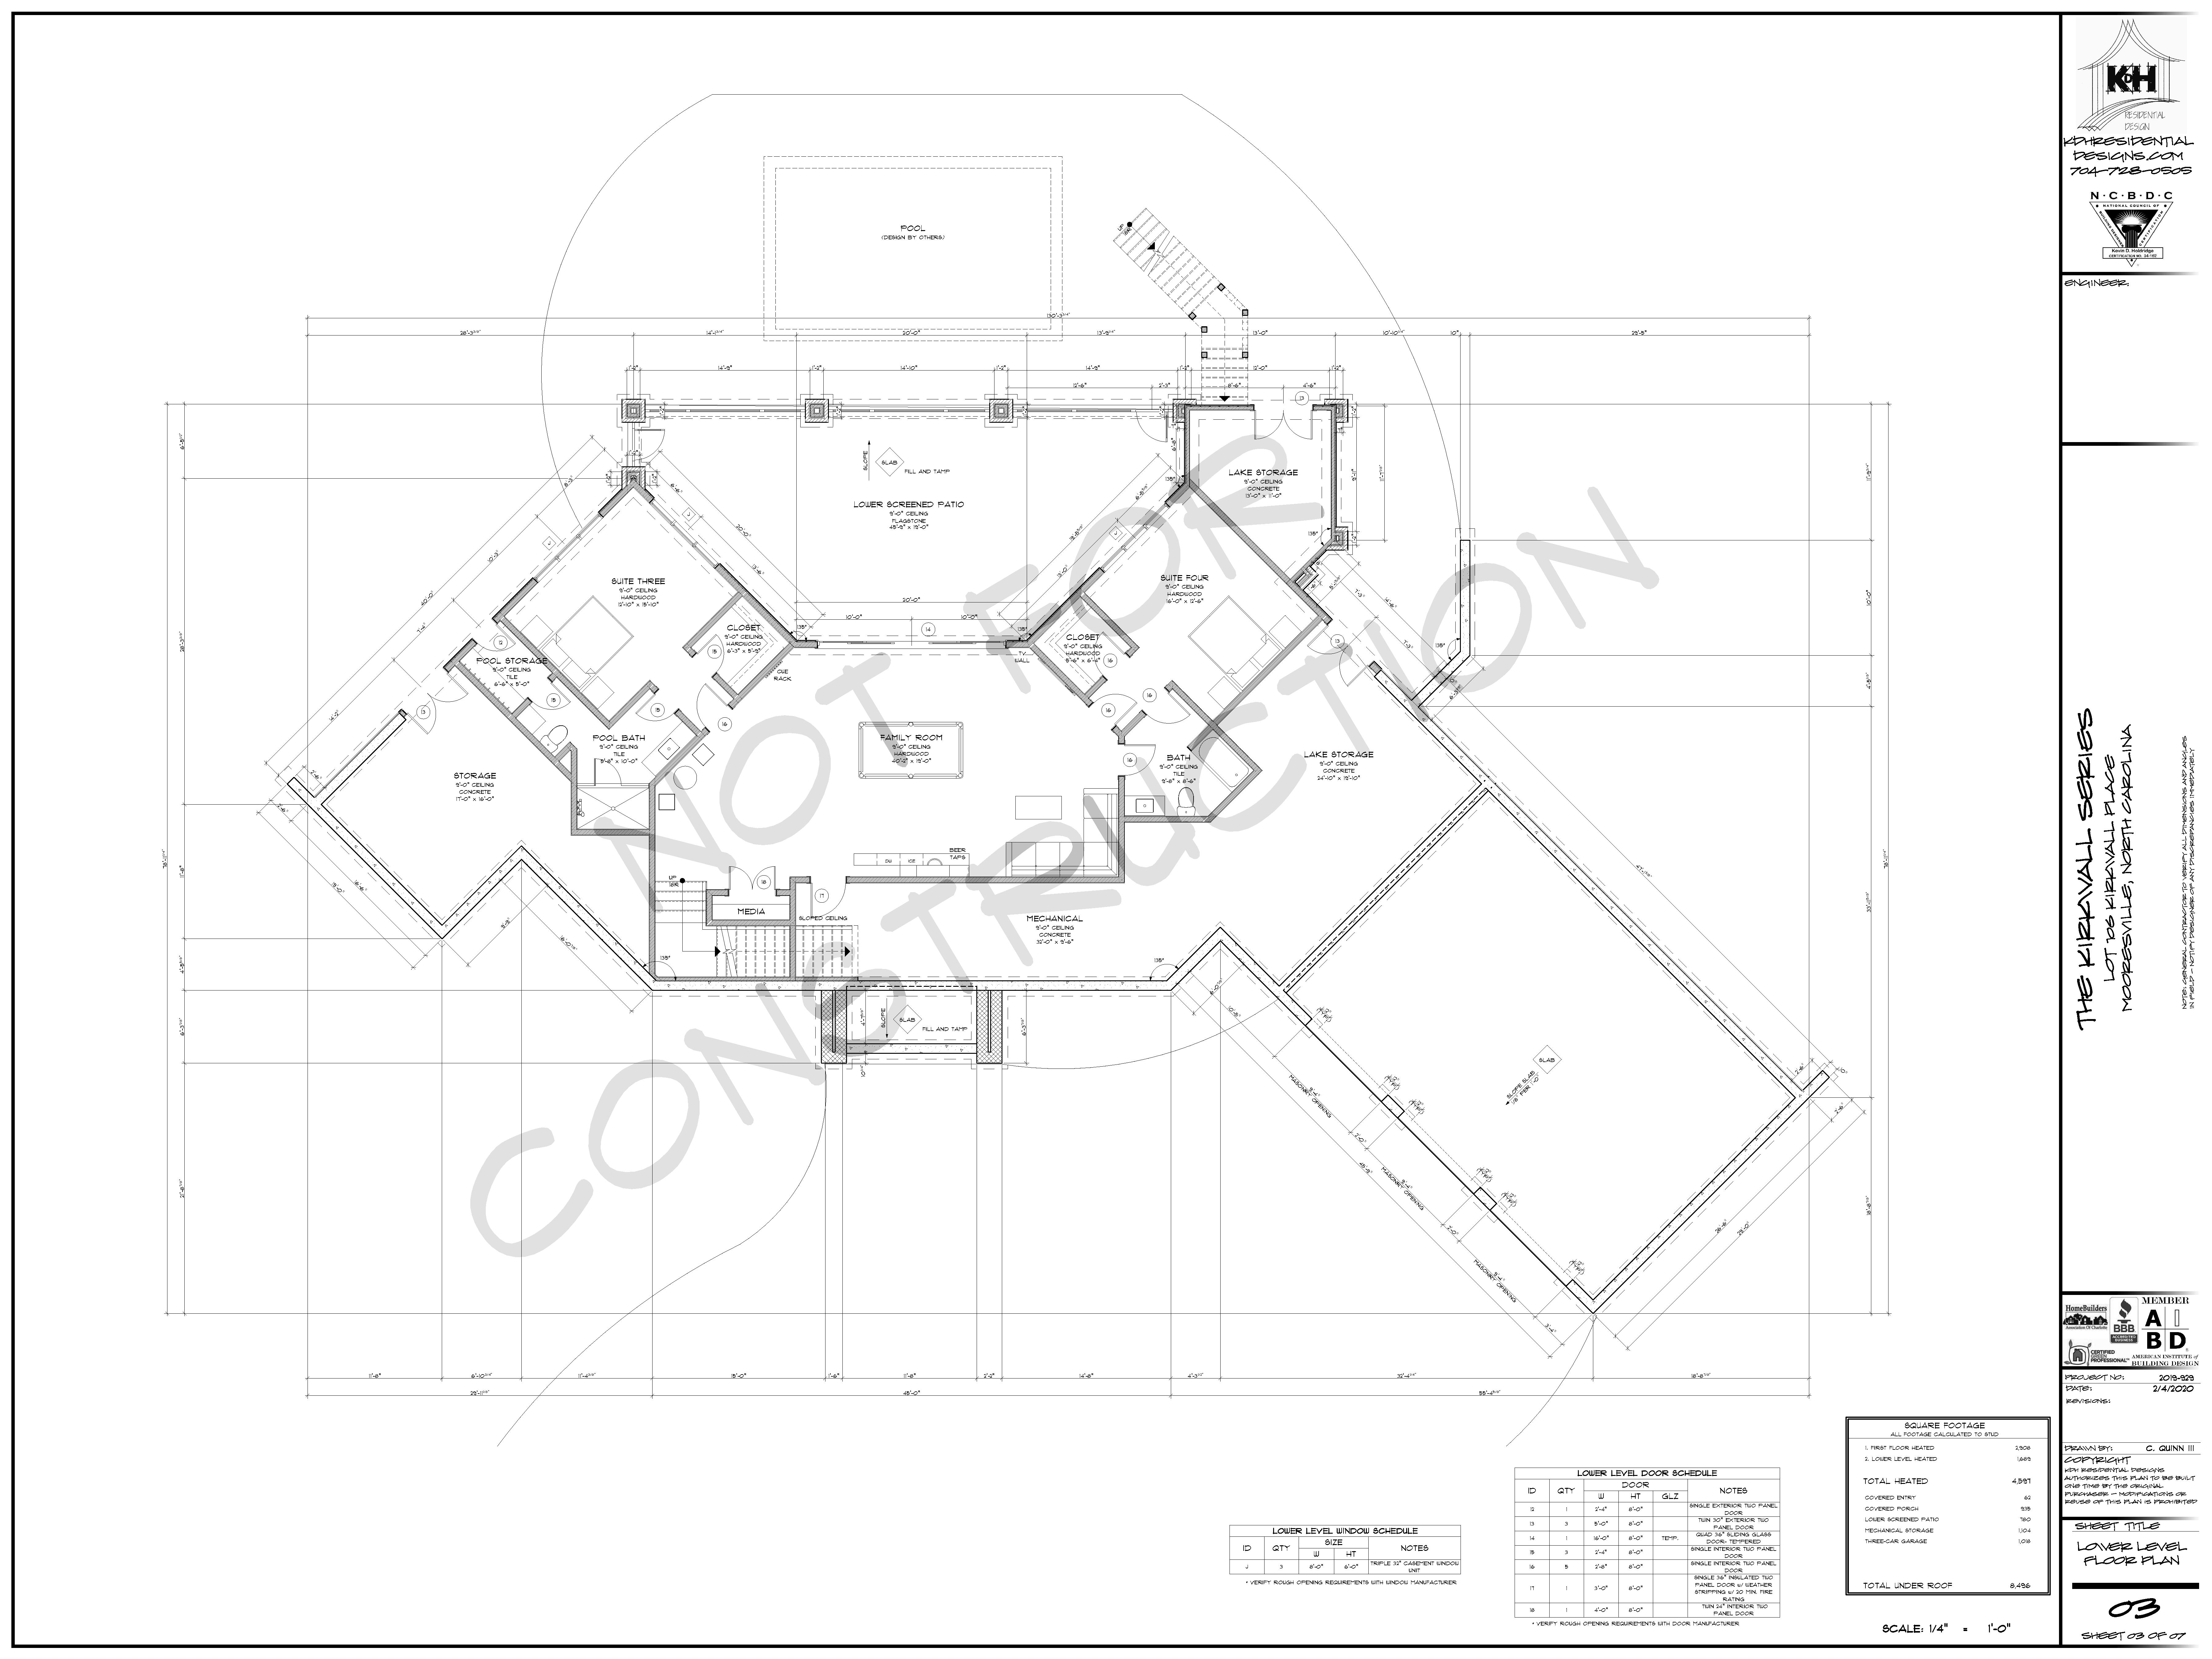 Proposed Floor Plan (Lower Level)